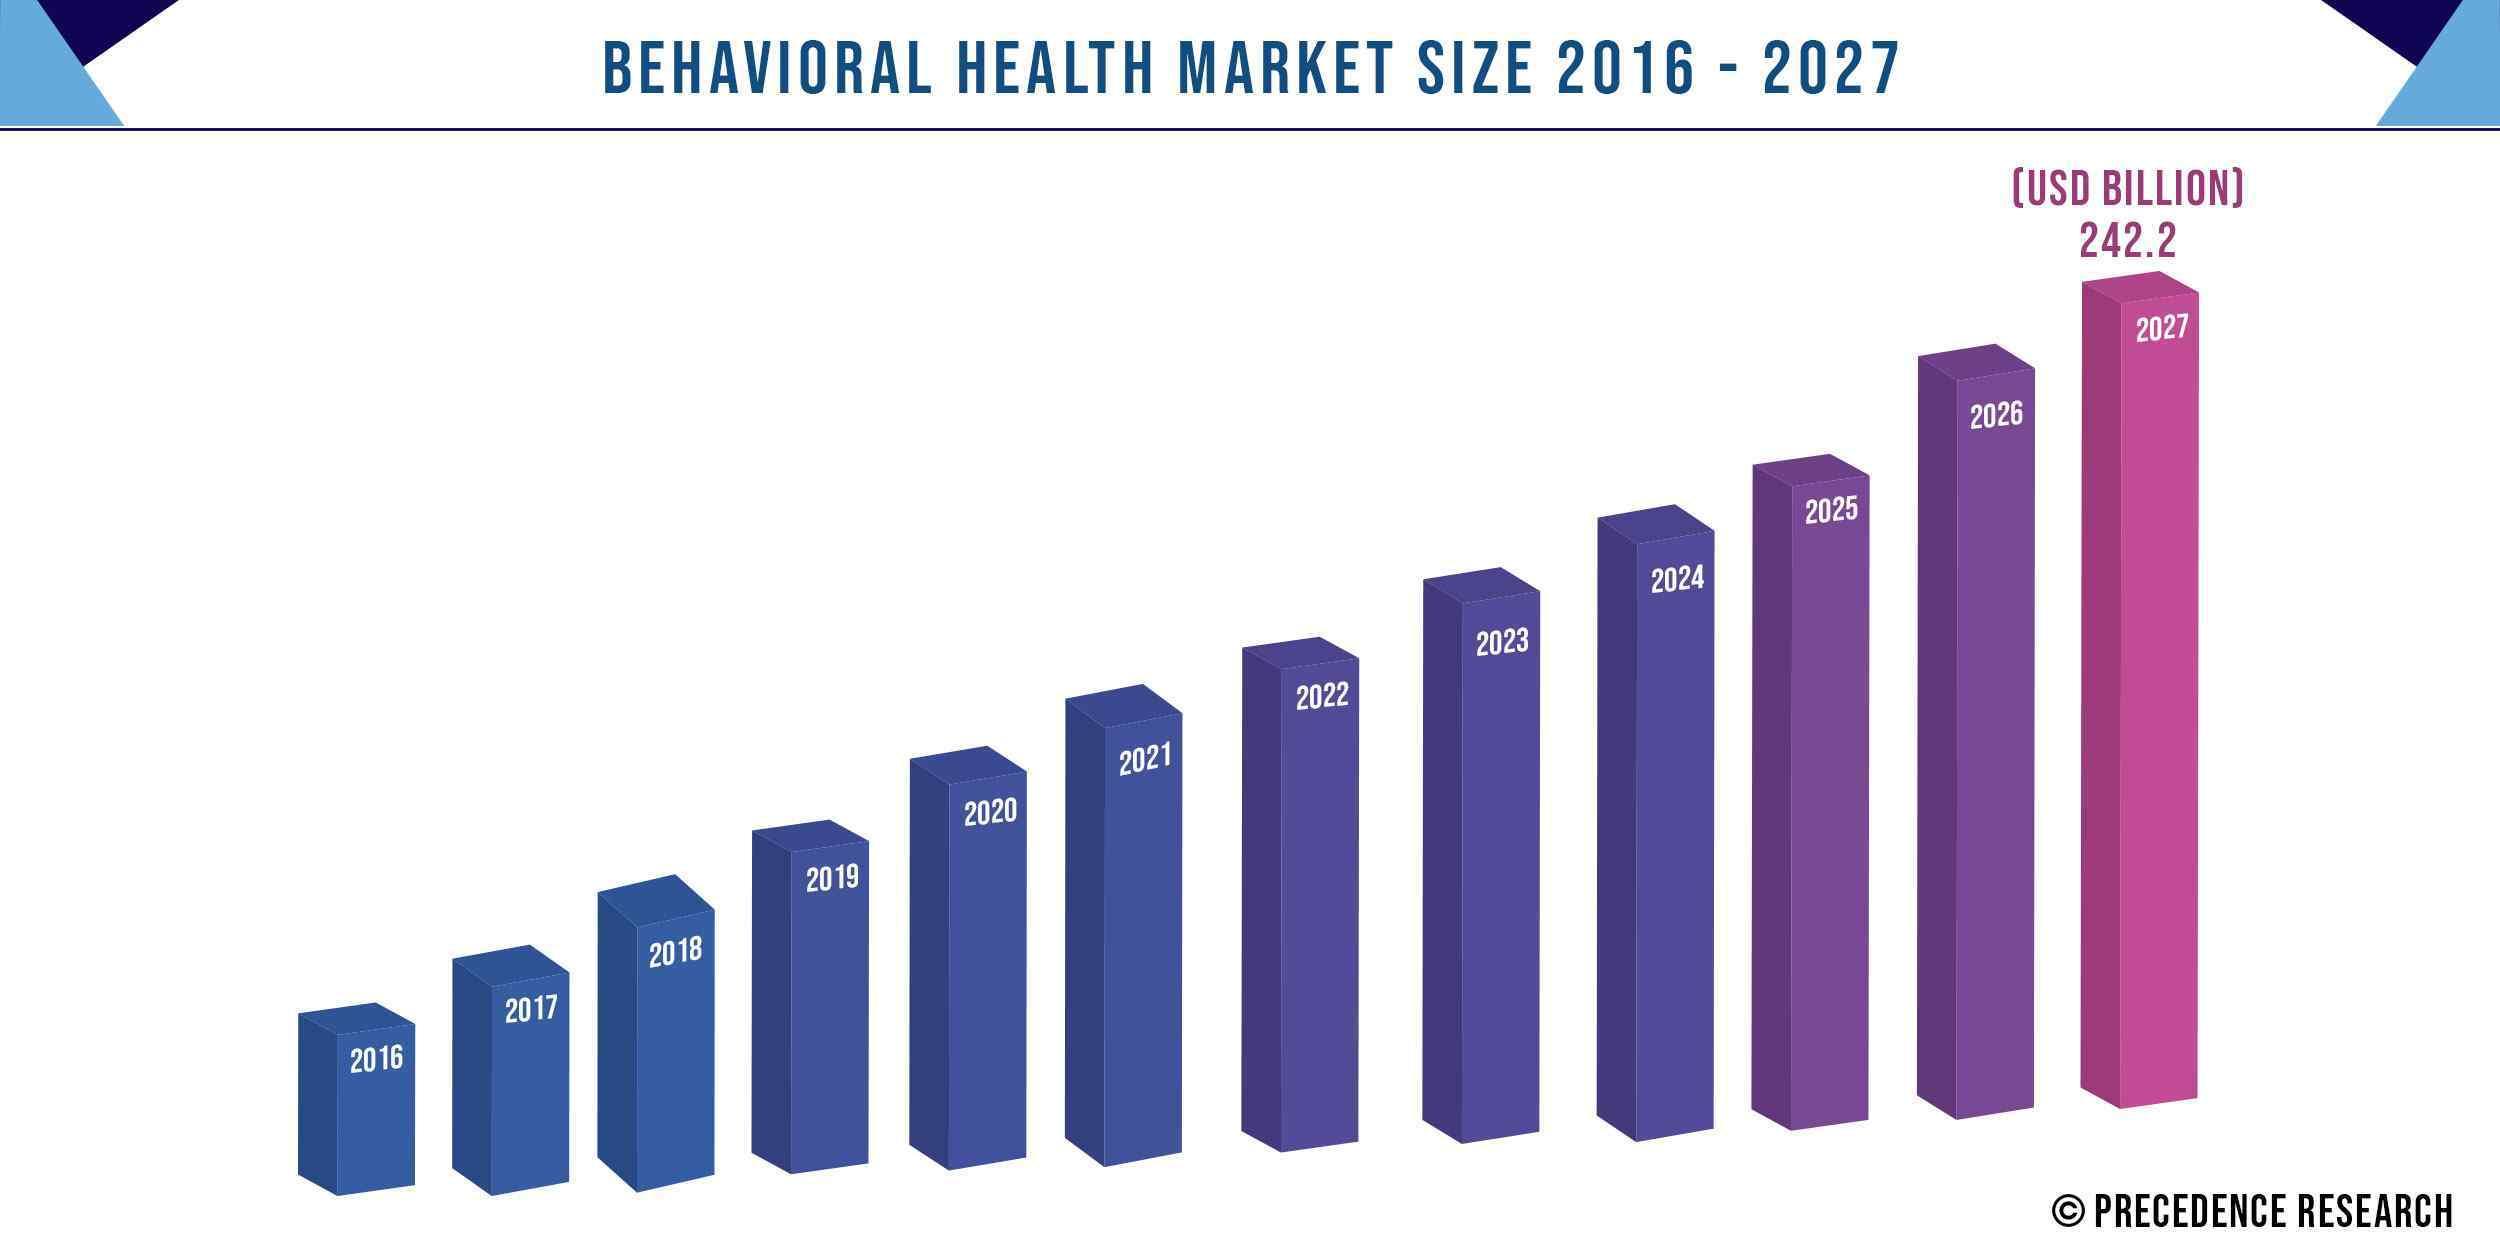 Behavioral Health Market Size 2016-2027